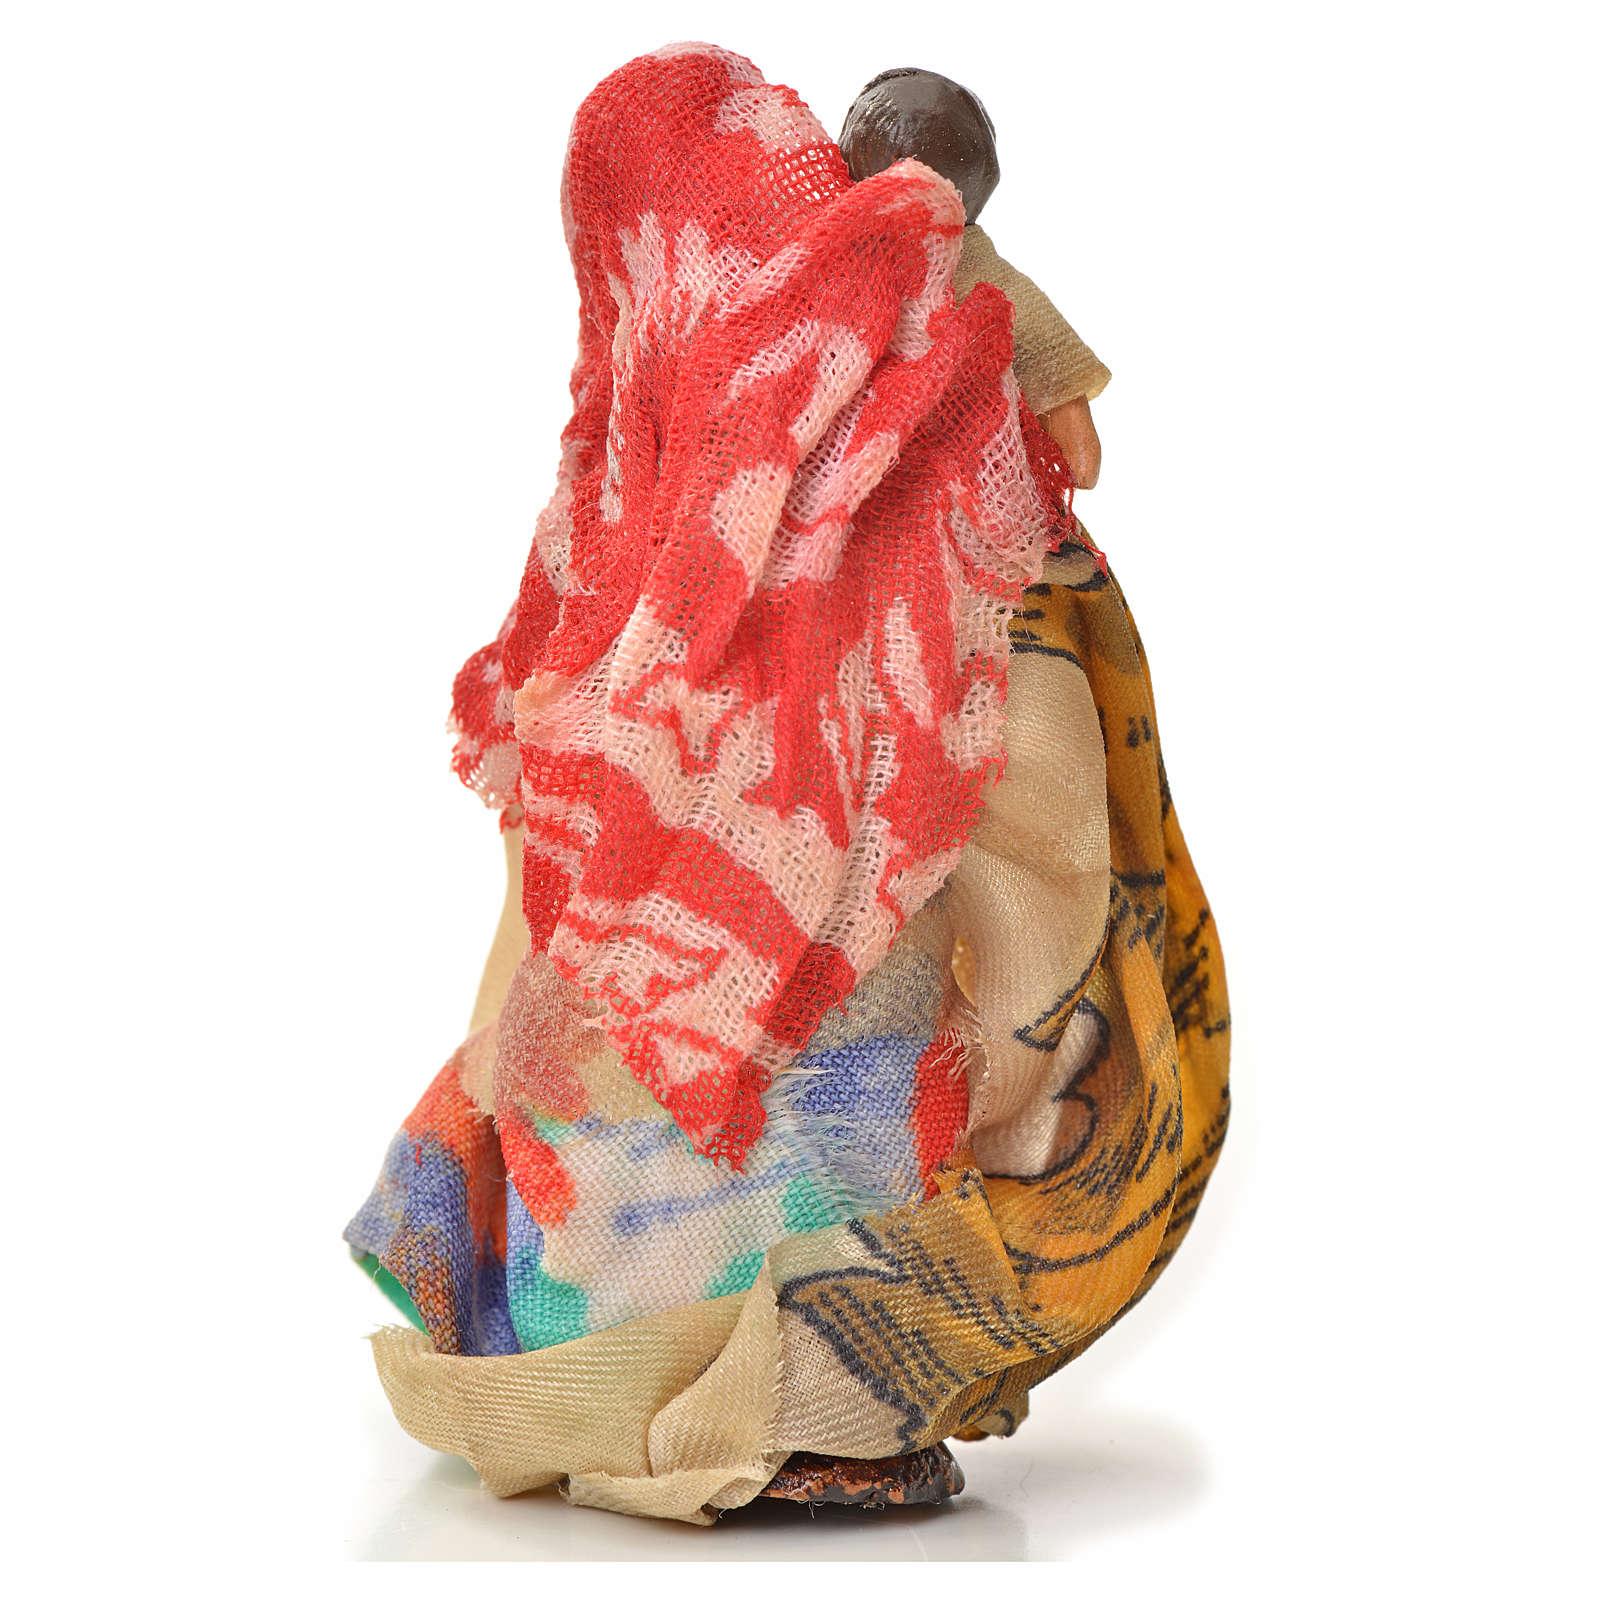 Mujer con niño en brazos 6cm pesebre napolitano 4